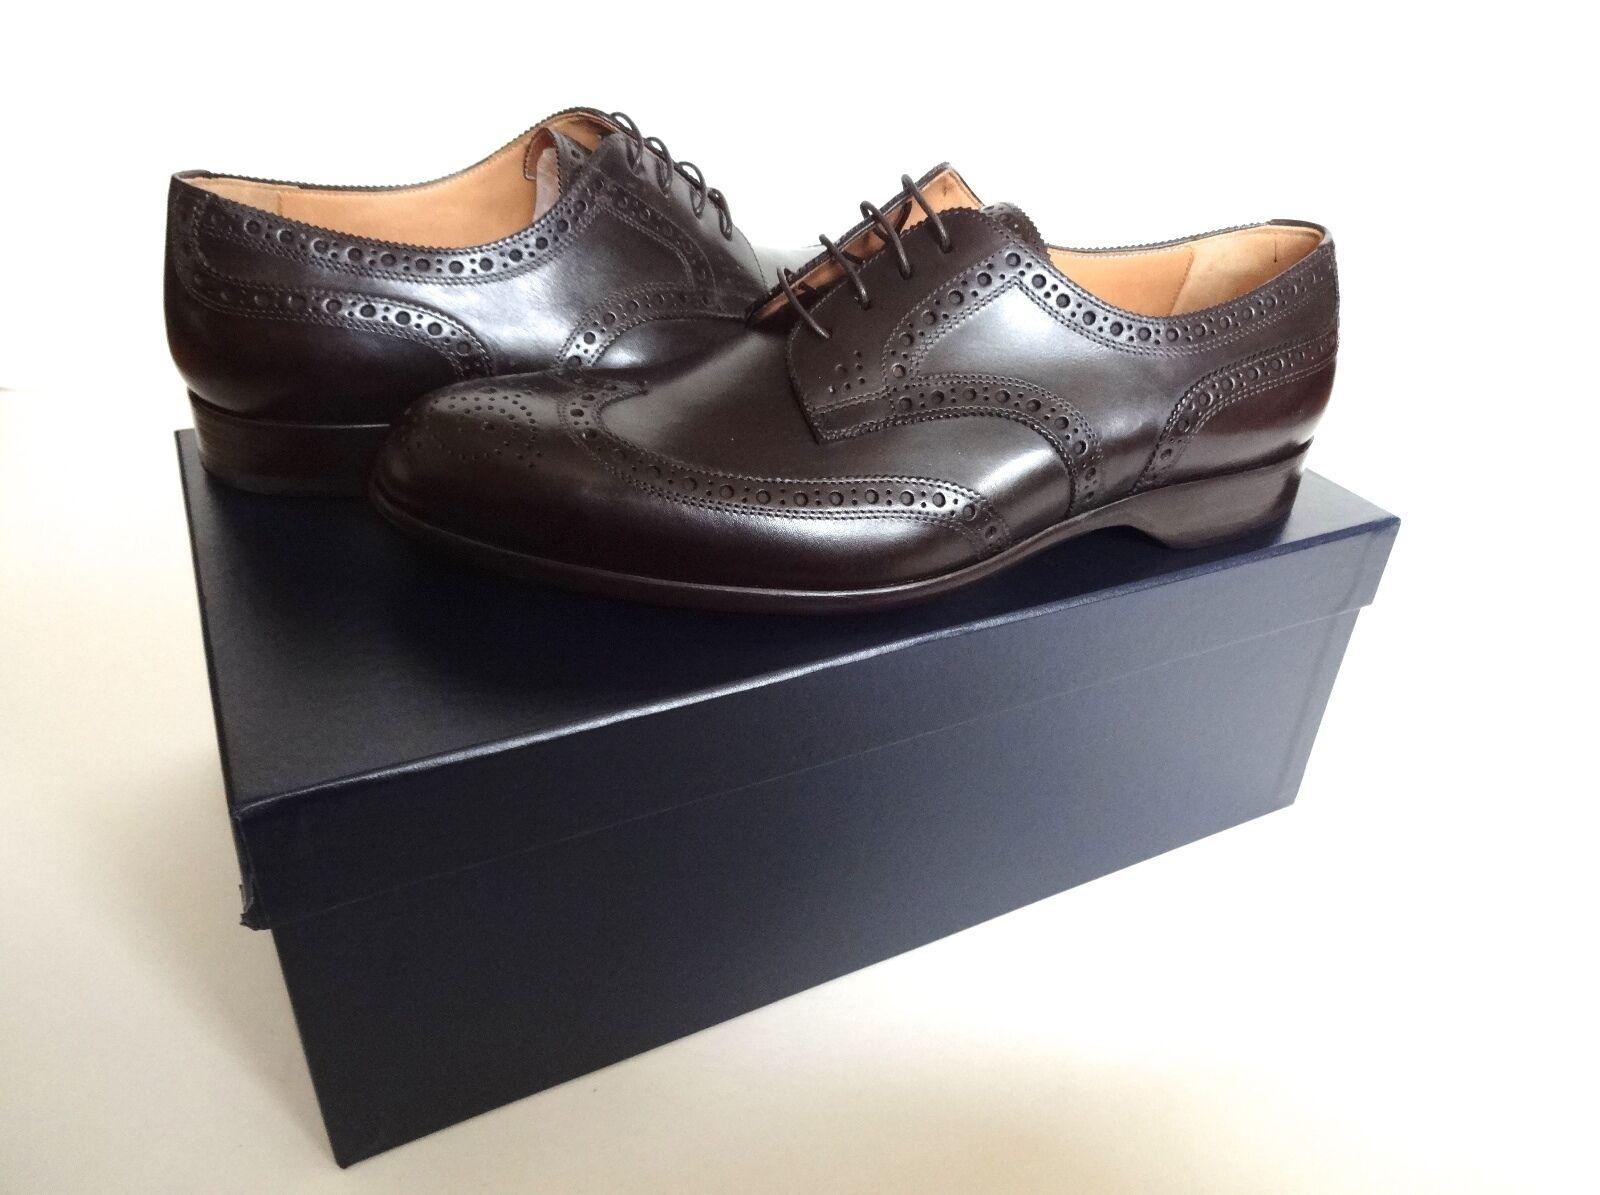 Scarpe casual da uomo  New Ralph Lauren Collection Dark Brown Leather Chapman Wingtip Oxford Shoes 8.5